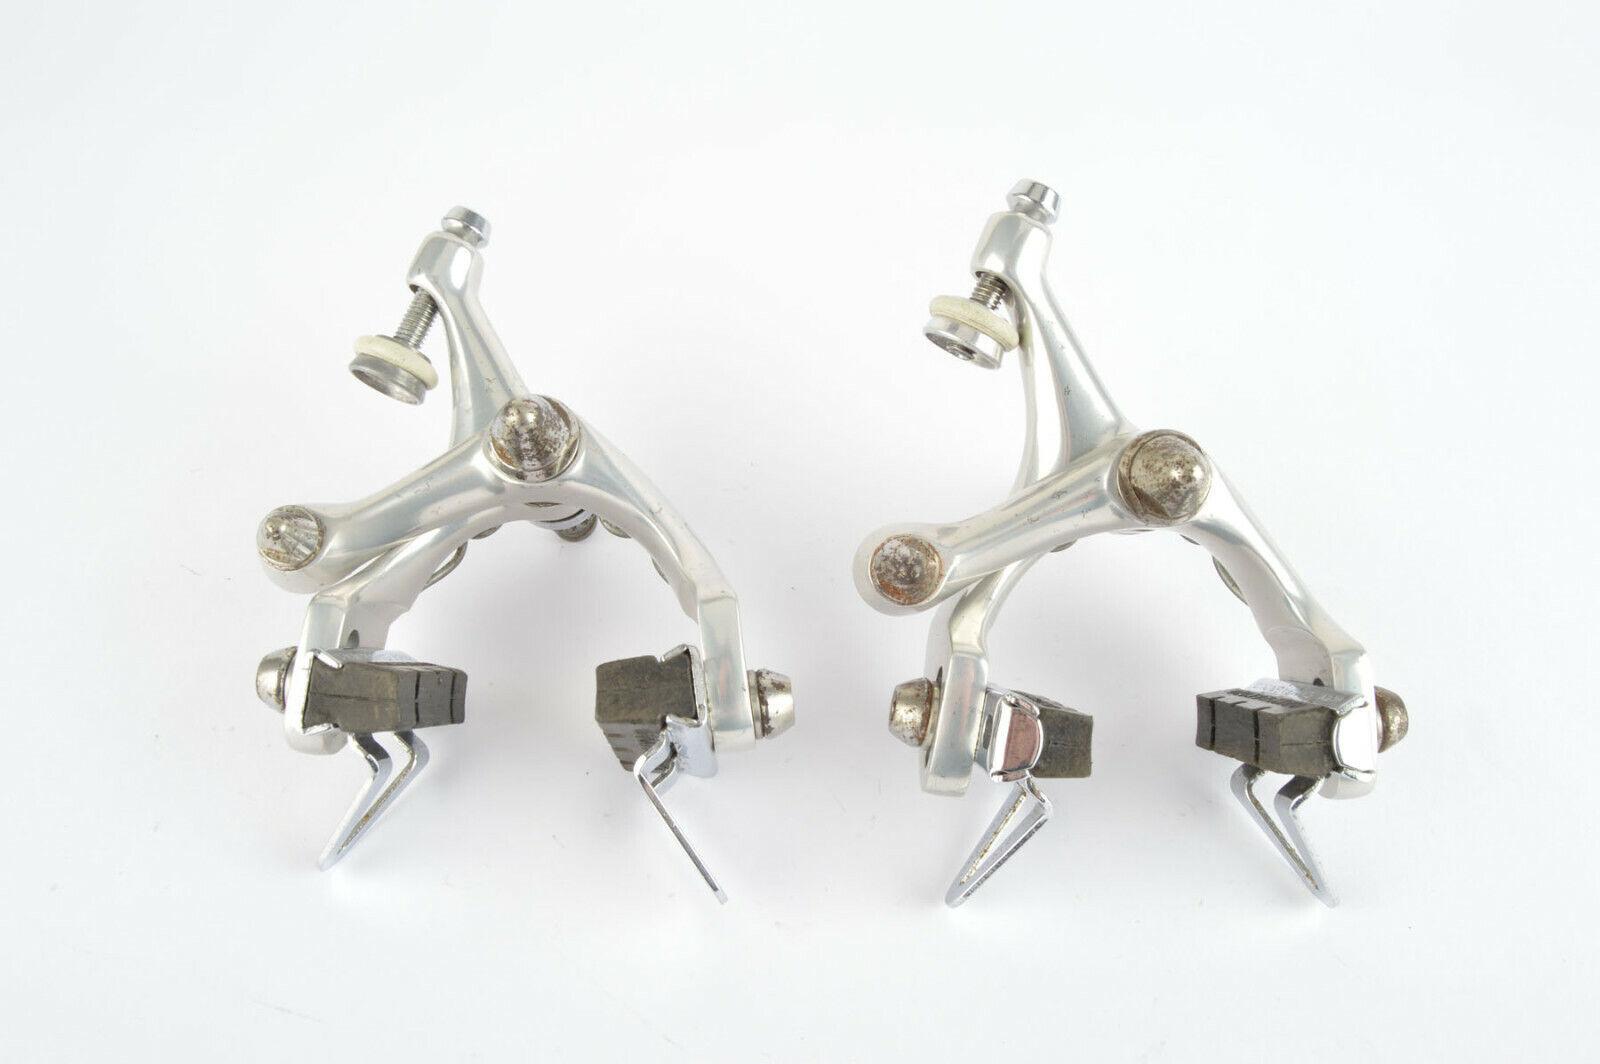 CAMPAGNOLO CAMPAGNOLO CAMPAGNOLO ATHENA monoplaner  d500 standard reach brake calipers e37783